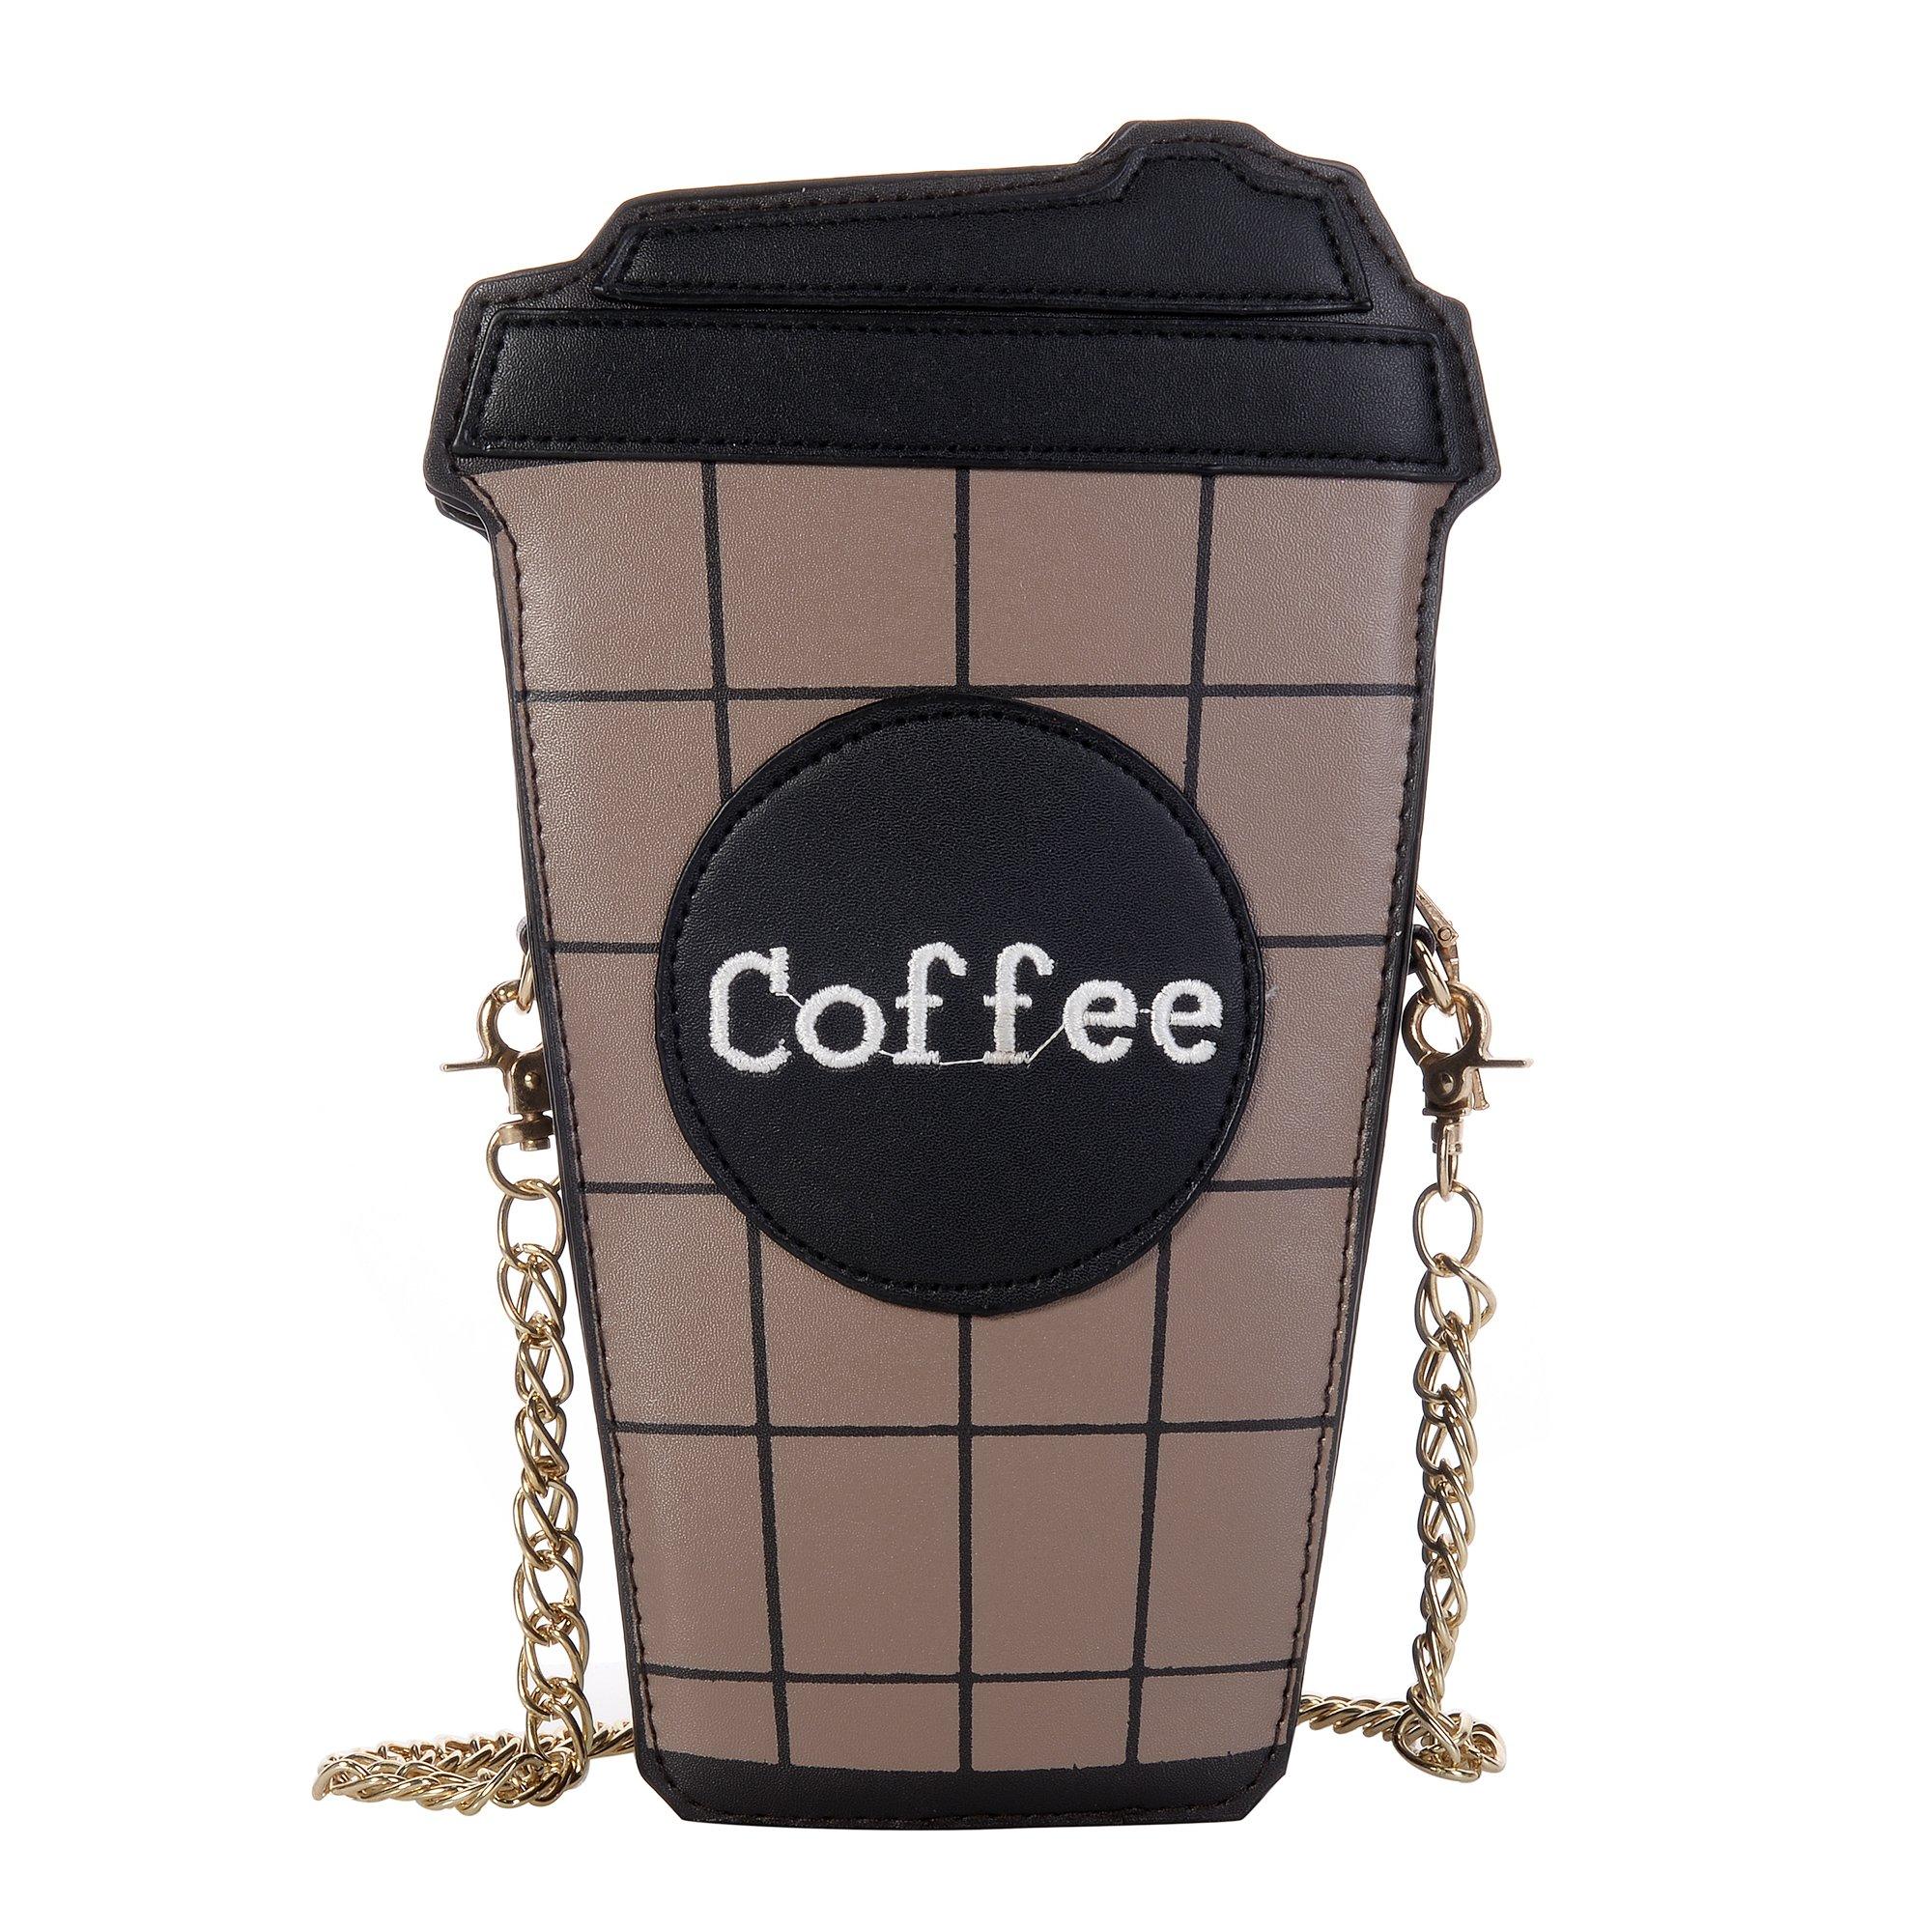 QZUnique Women's Mini Summer Cute Cartoon Coffee Cup Pattern Clutch Cross body Handbag Purse